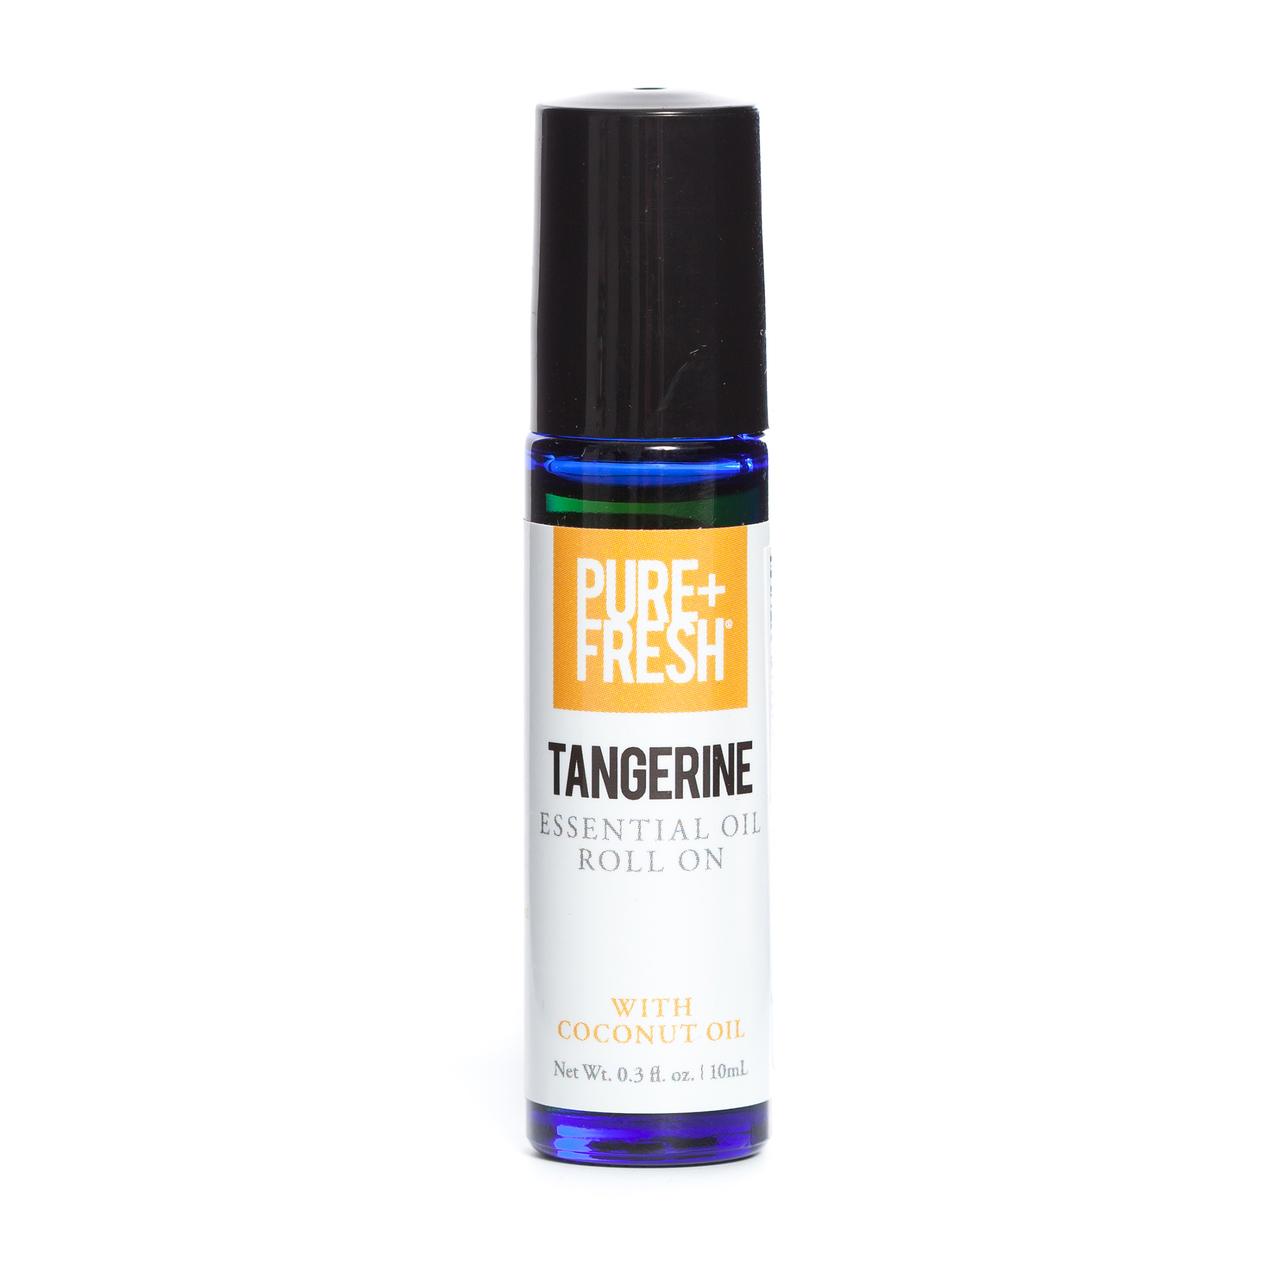 0.3 fl oz. Bottle of Pure+Fresh Tangerine Essential Oil Roll On